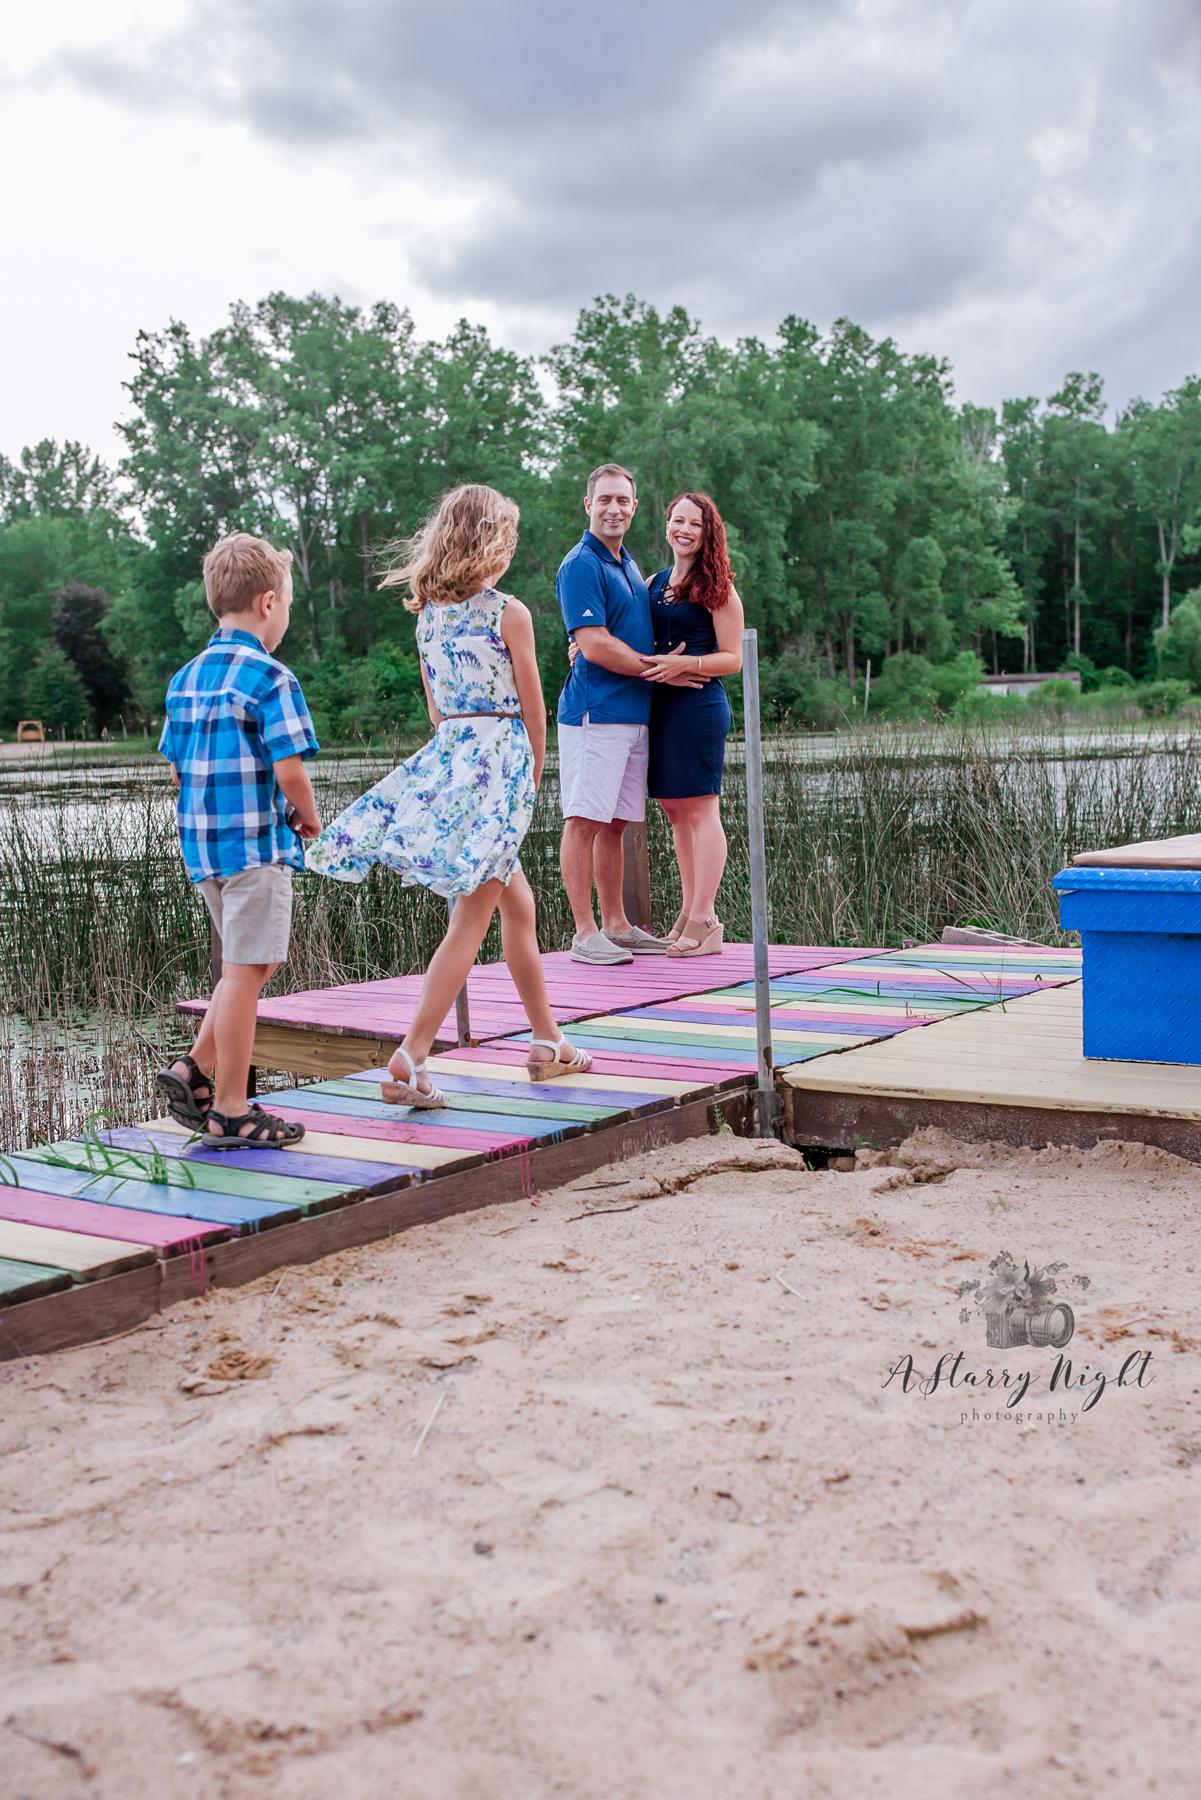 Lake-thirteen-central-michigan-family-photography.jpg